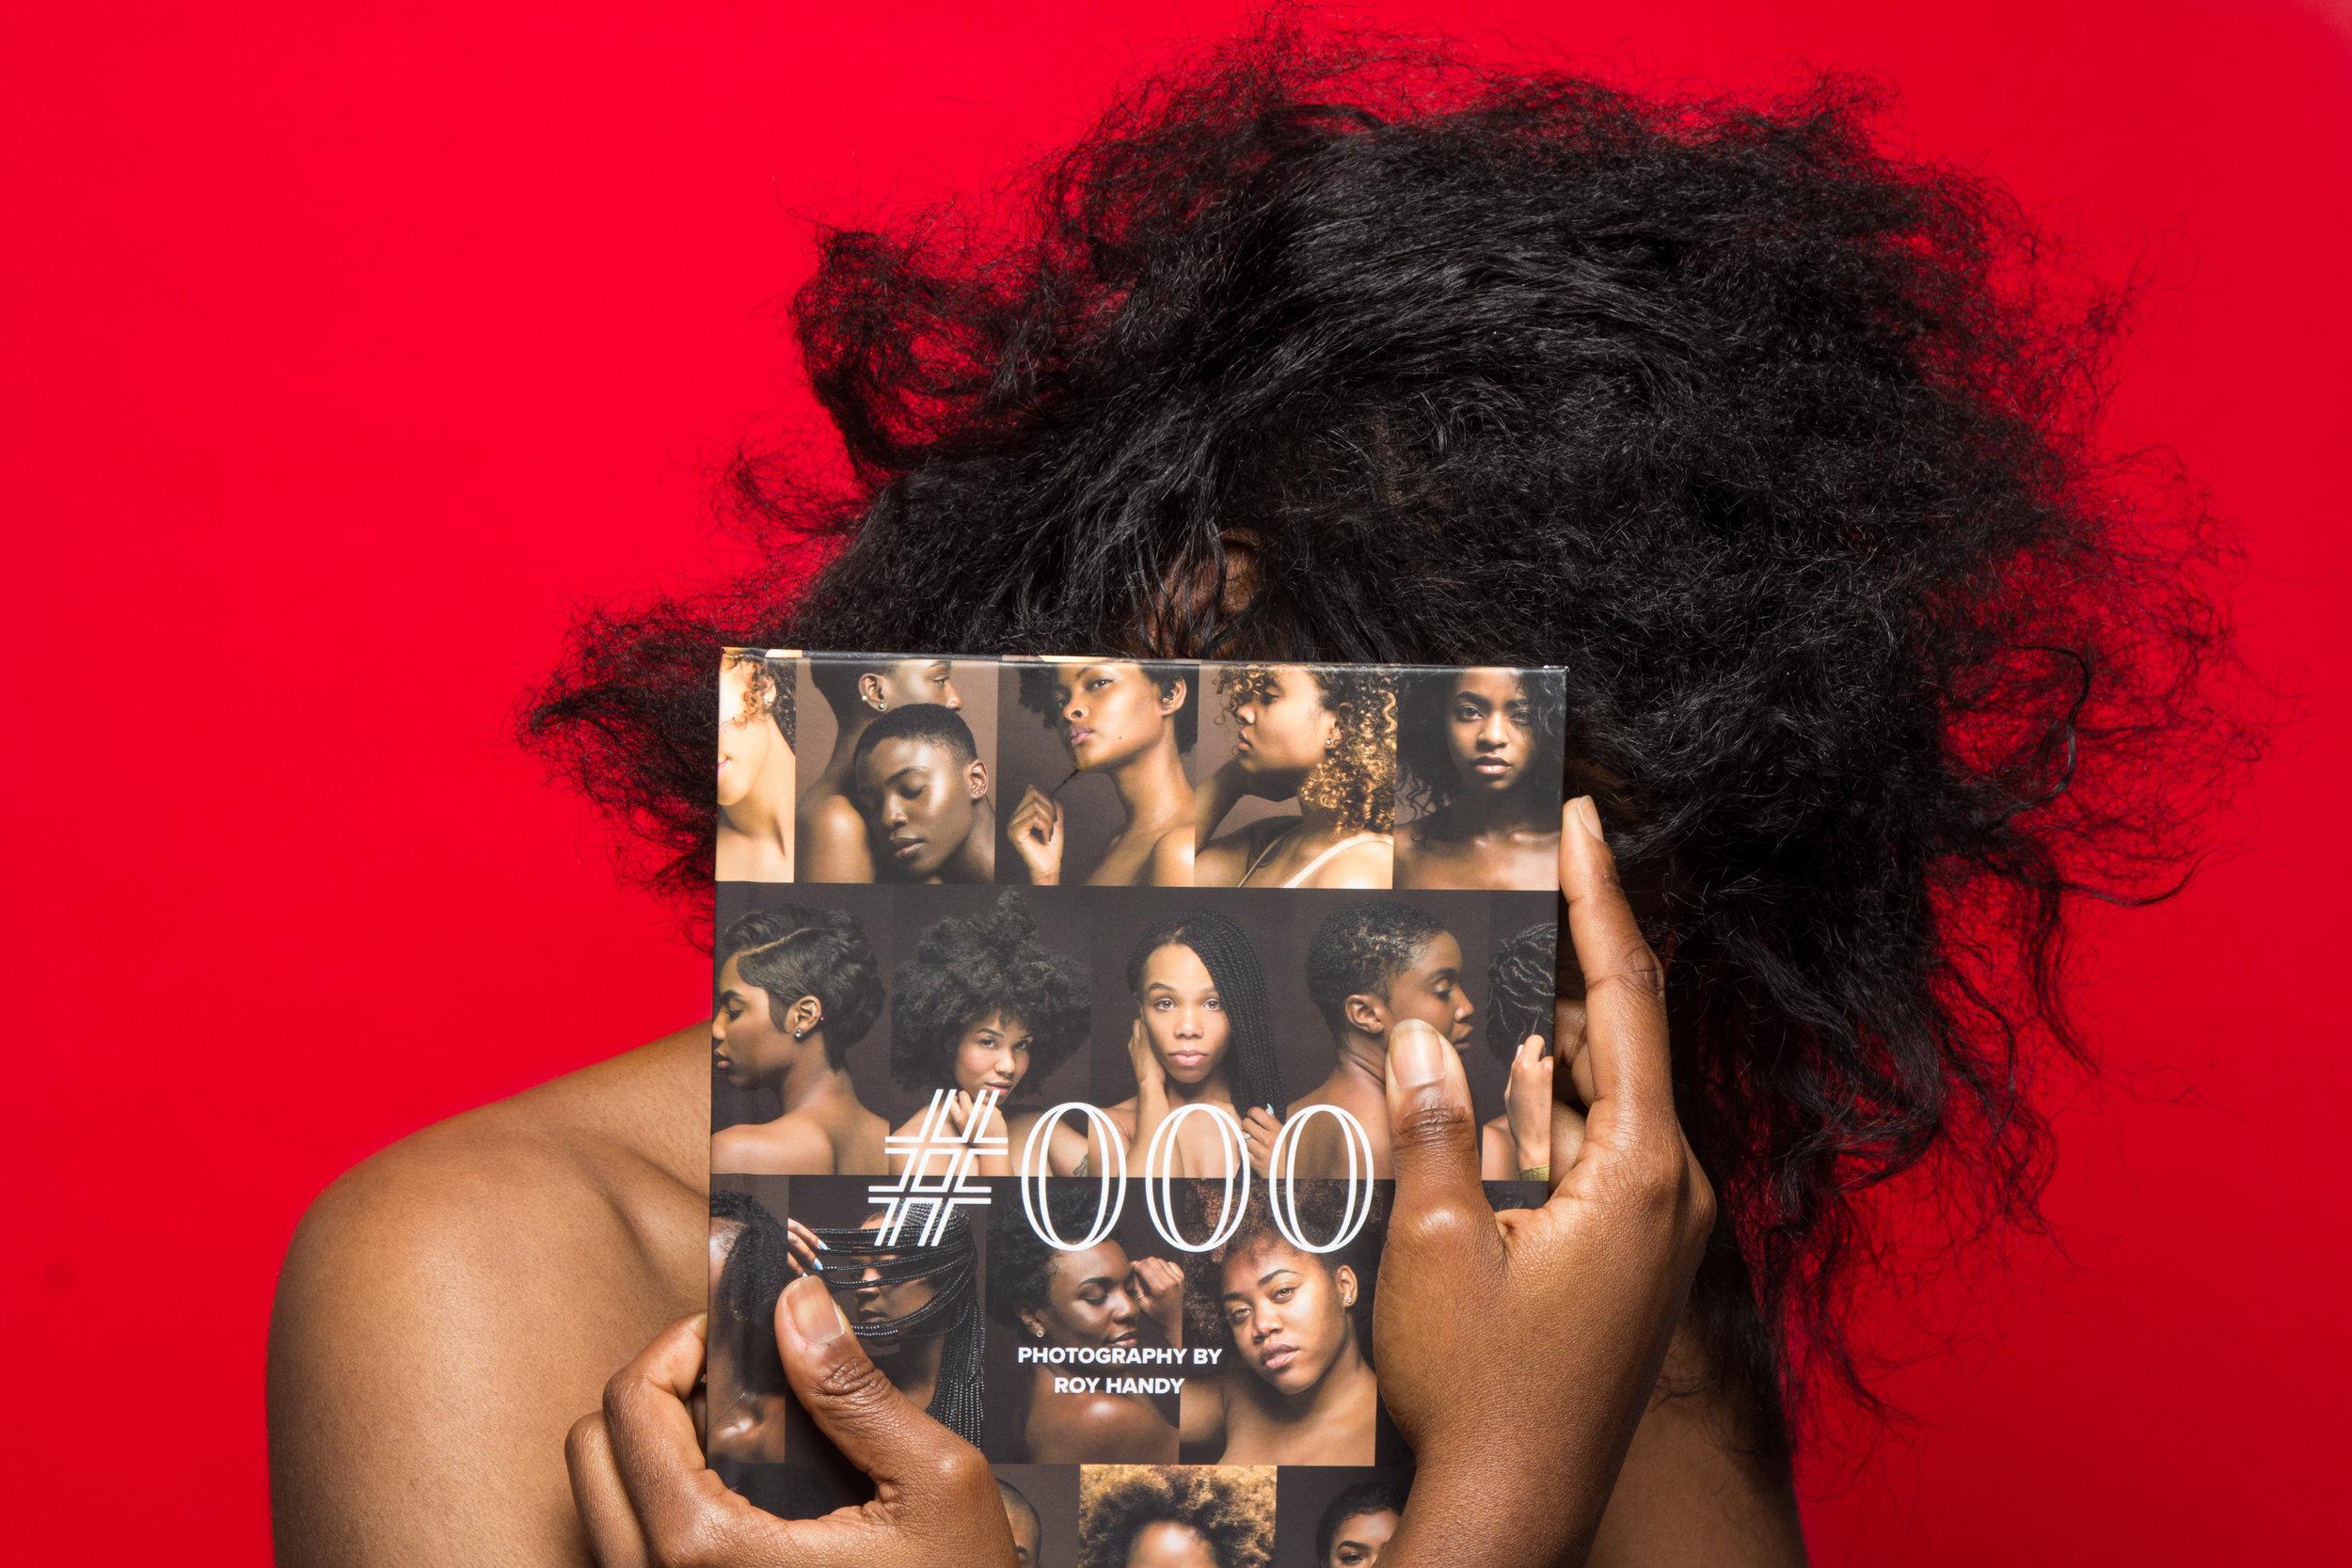 000_promo-2.jpg